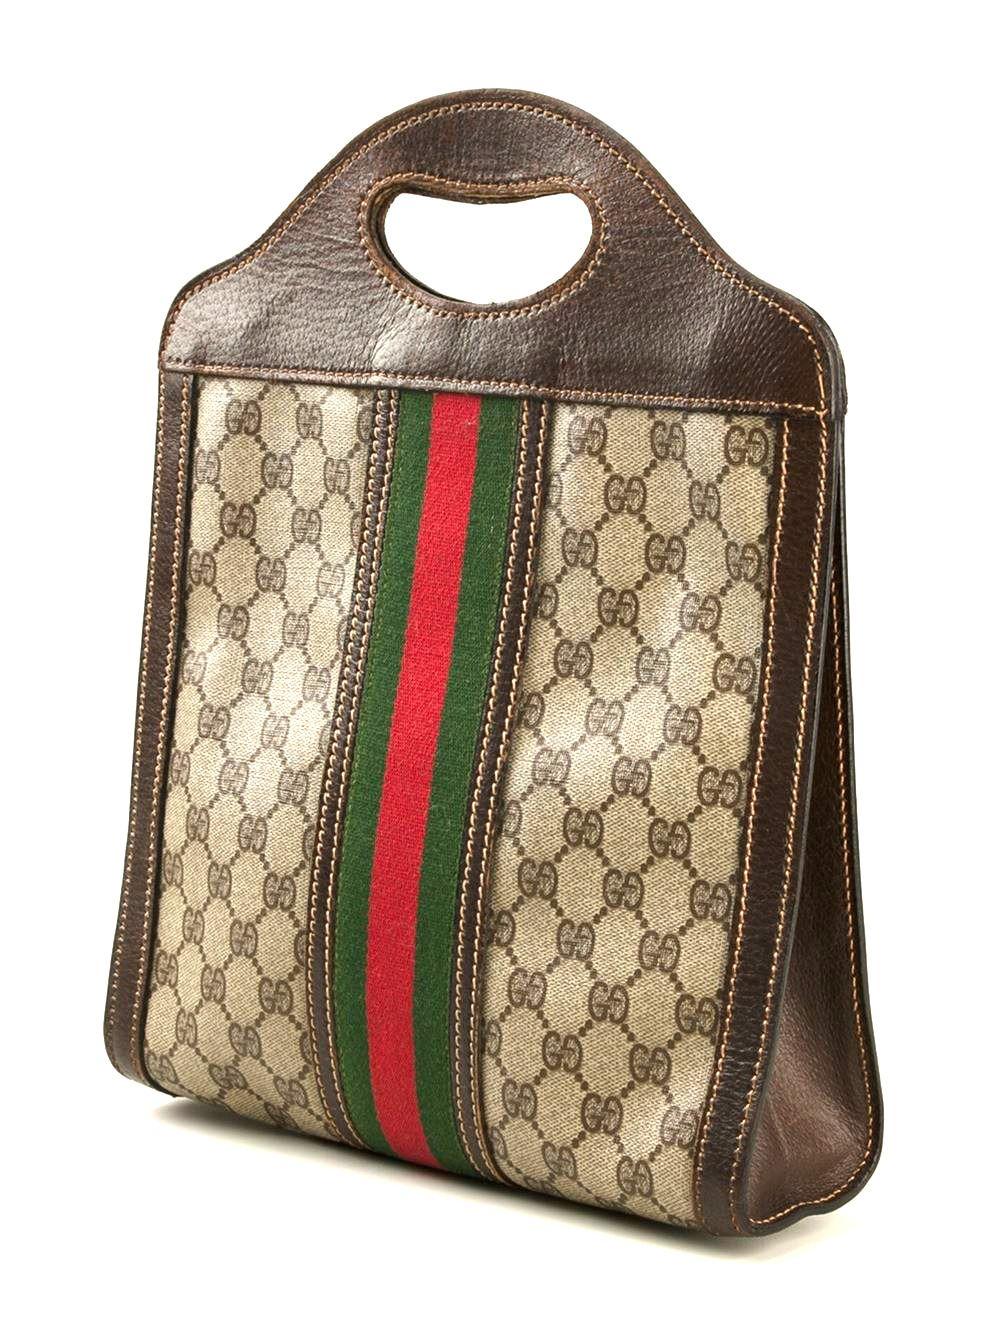 1970s Gucci Tote Bag image 2  4ba4b14742e0d